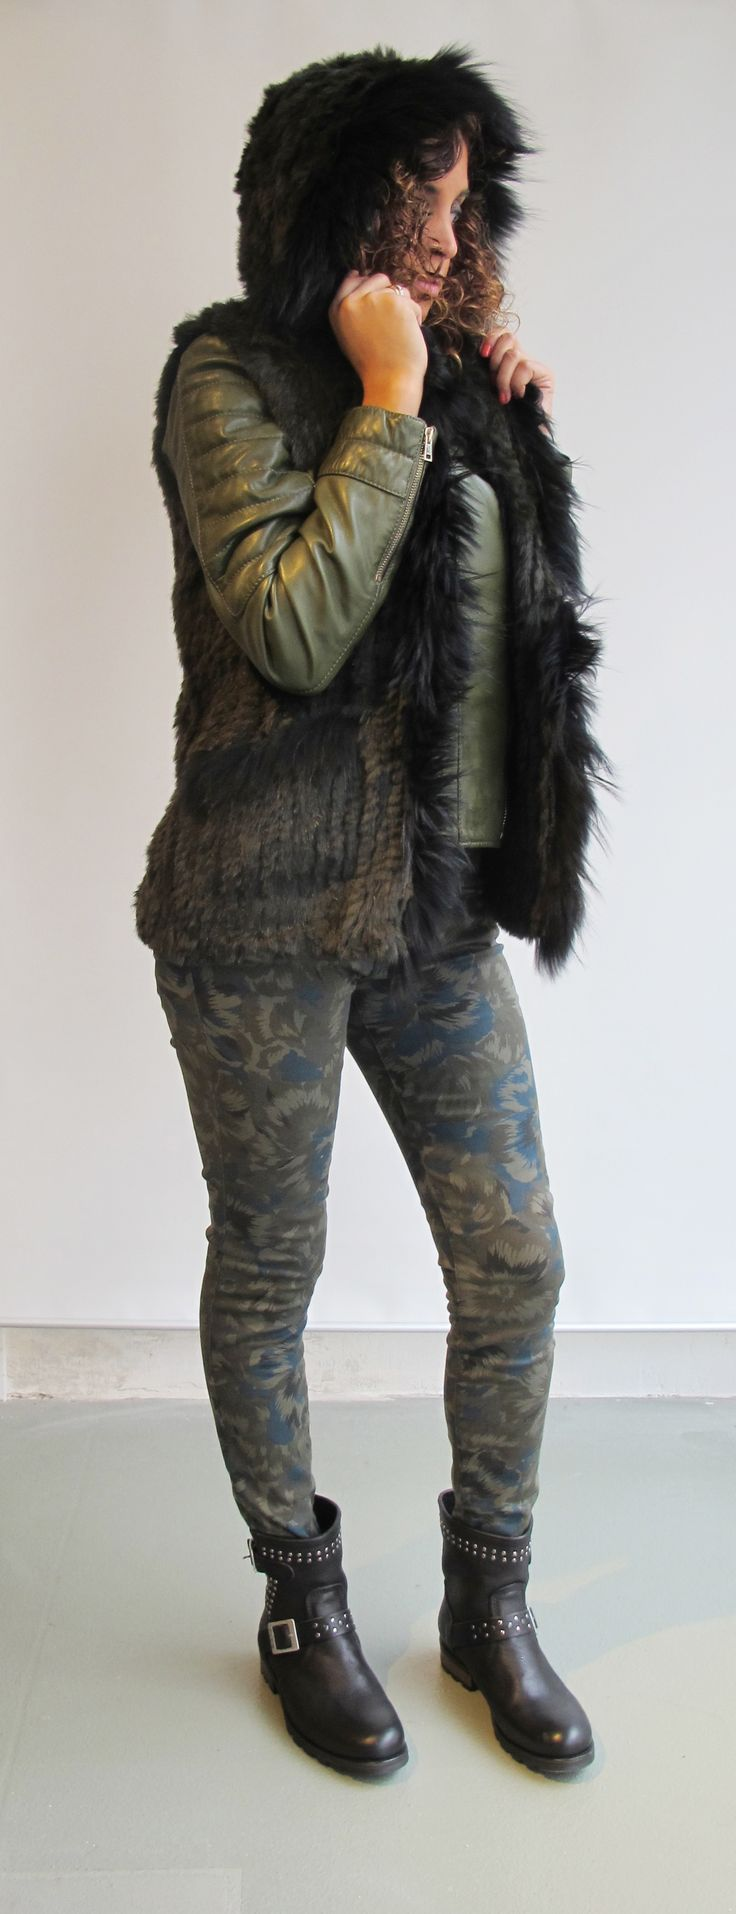 botas palladium hombre,Botas palladium. #wilcolook #moda